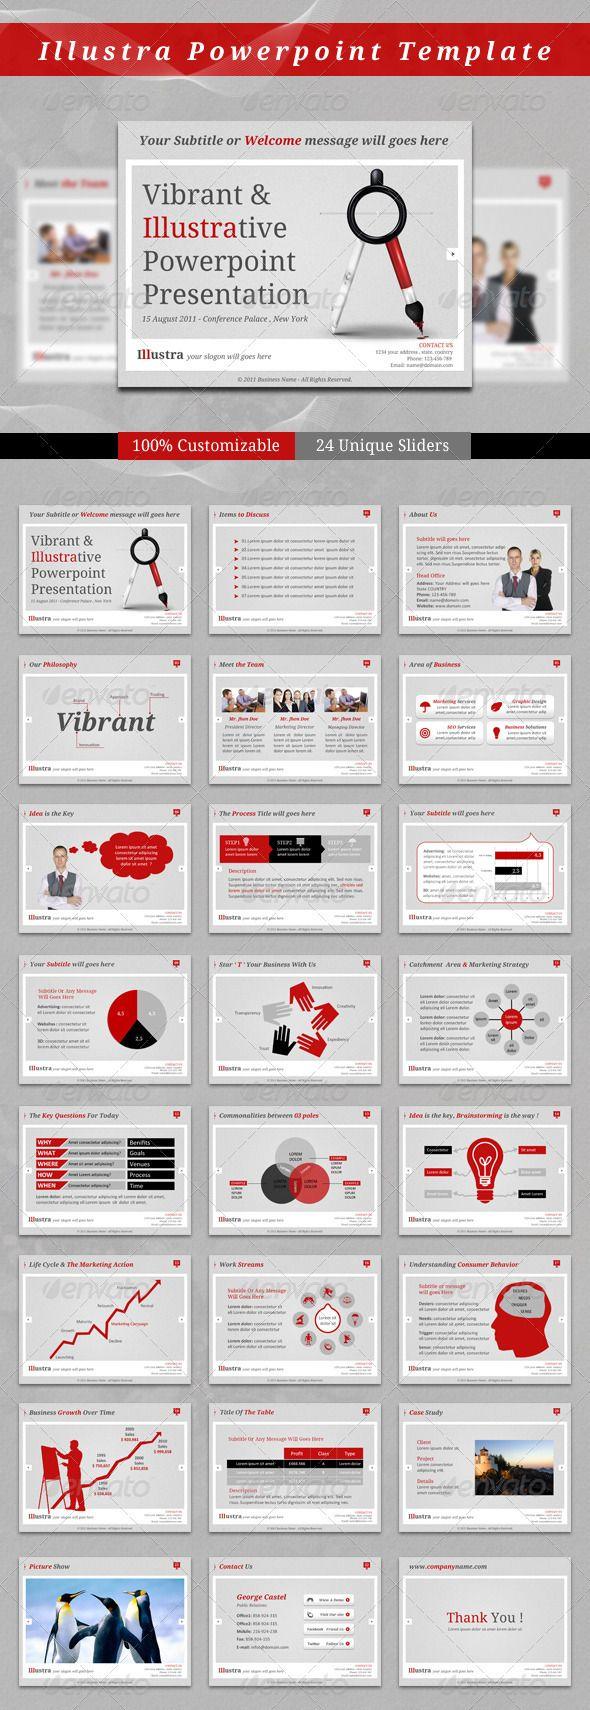 Powerpoint Presentation Rubric Template – brettfranklin.co